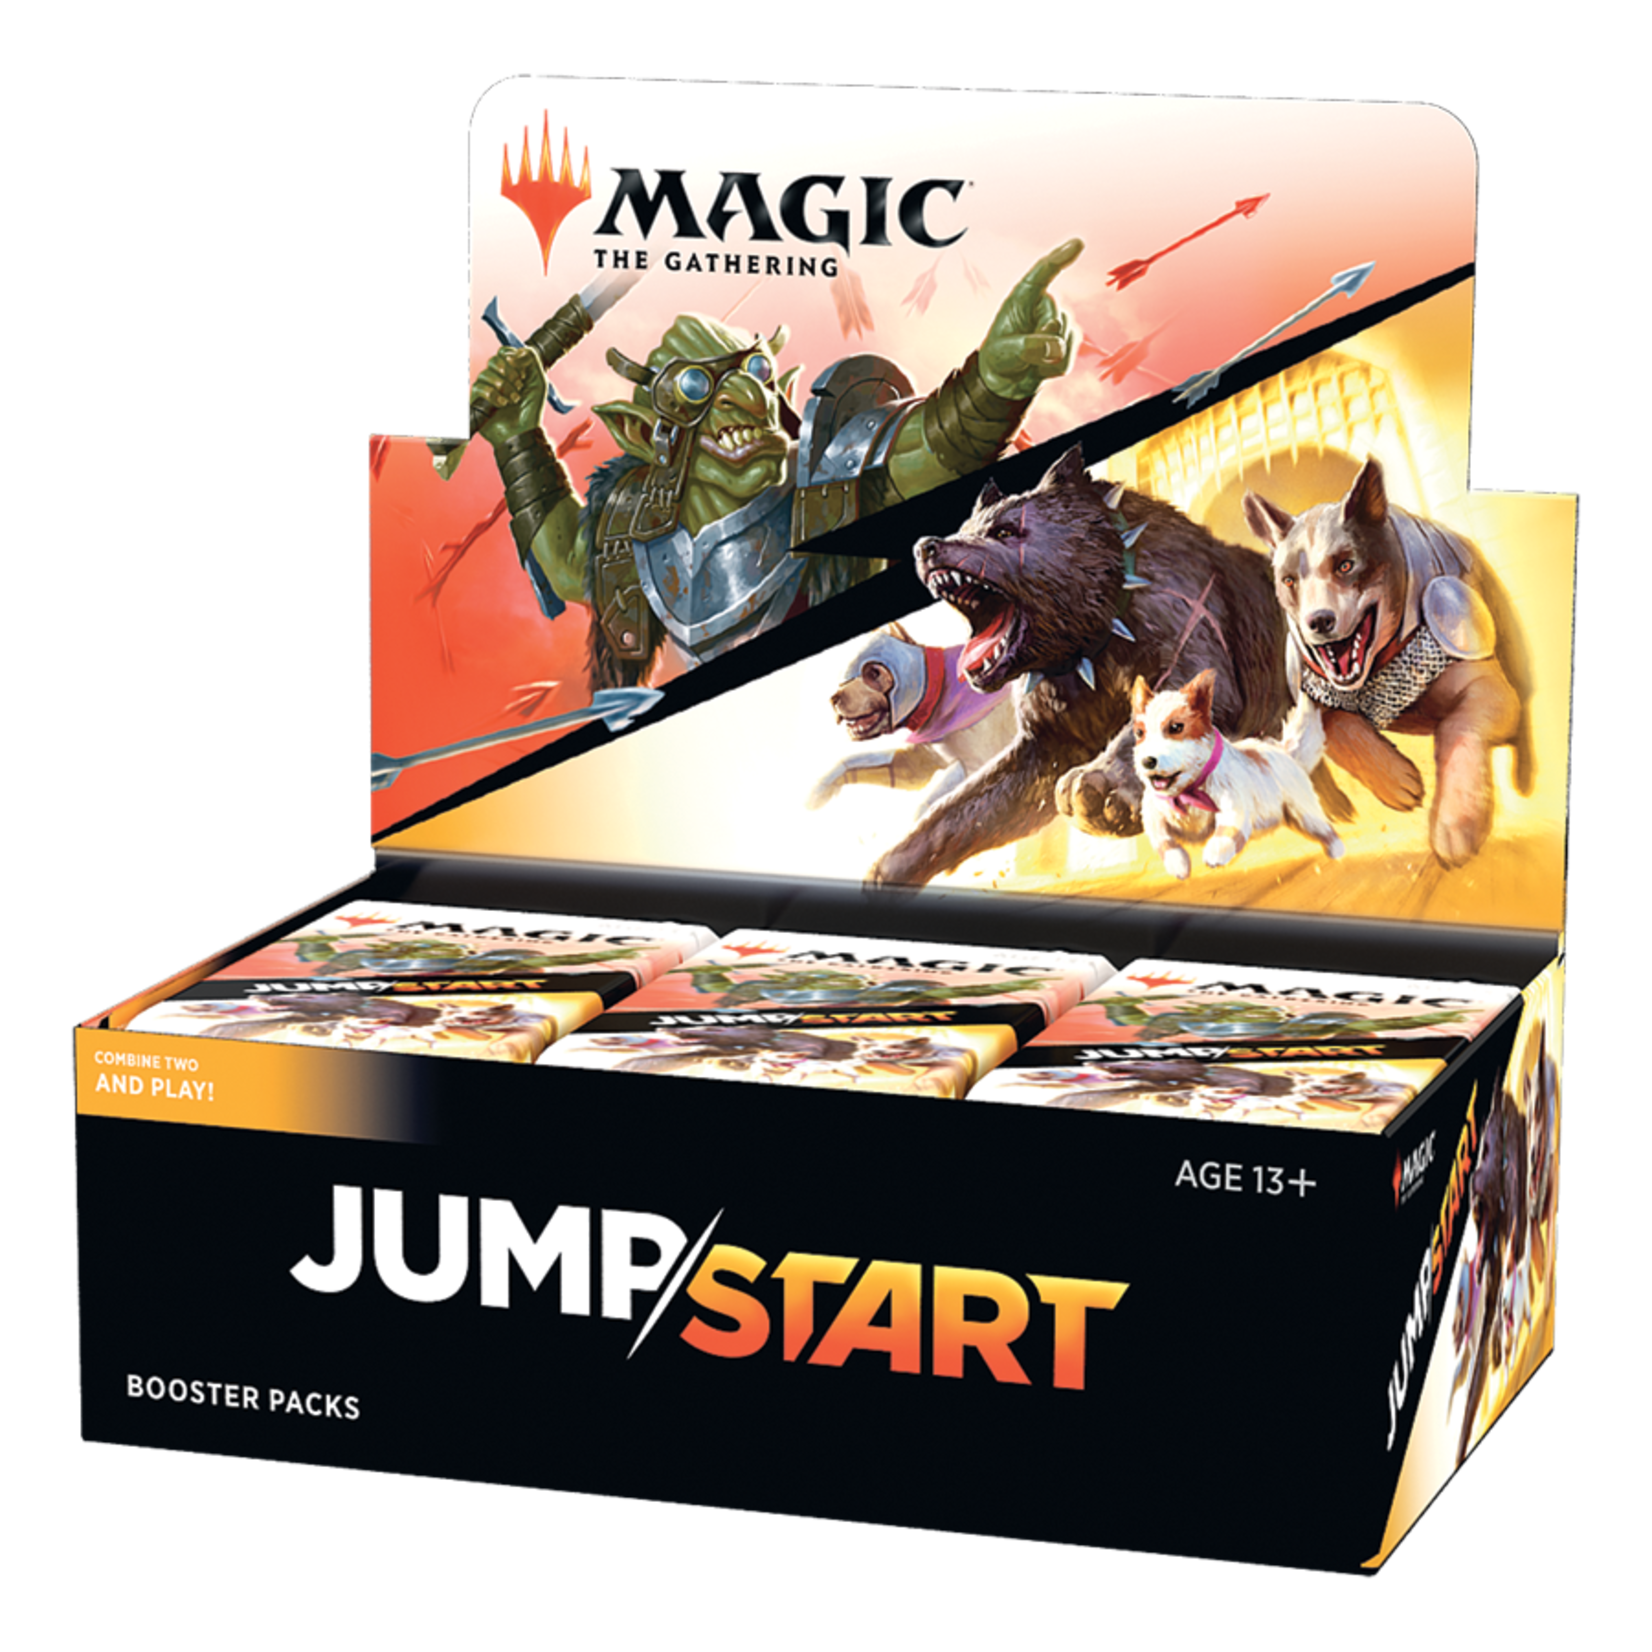 Magic: The Gathering Magic: The Gathering - Jumpstart Booster Box